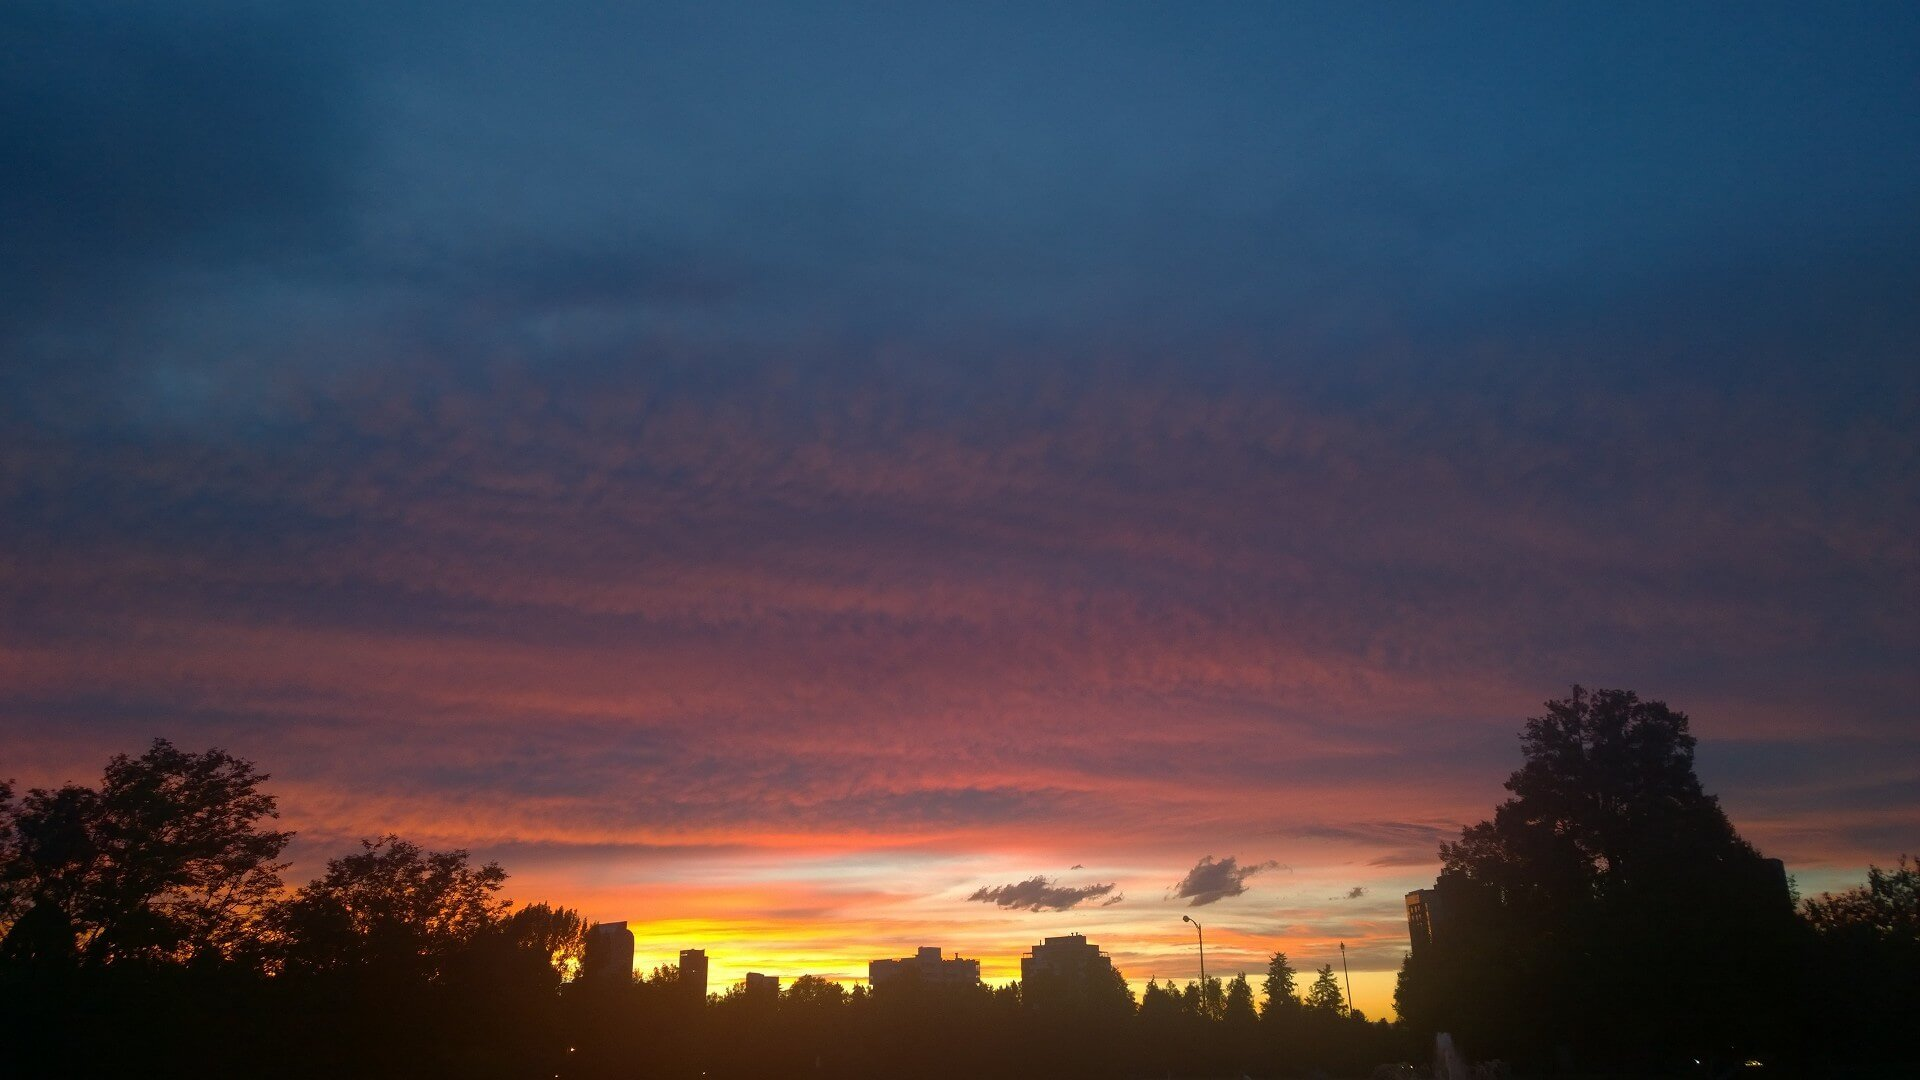 Sunset in Cheesman Park